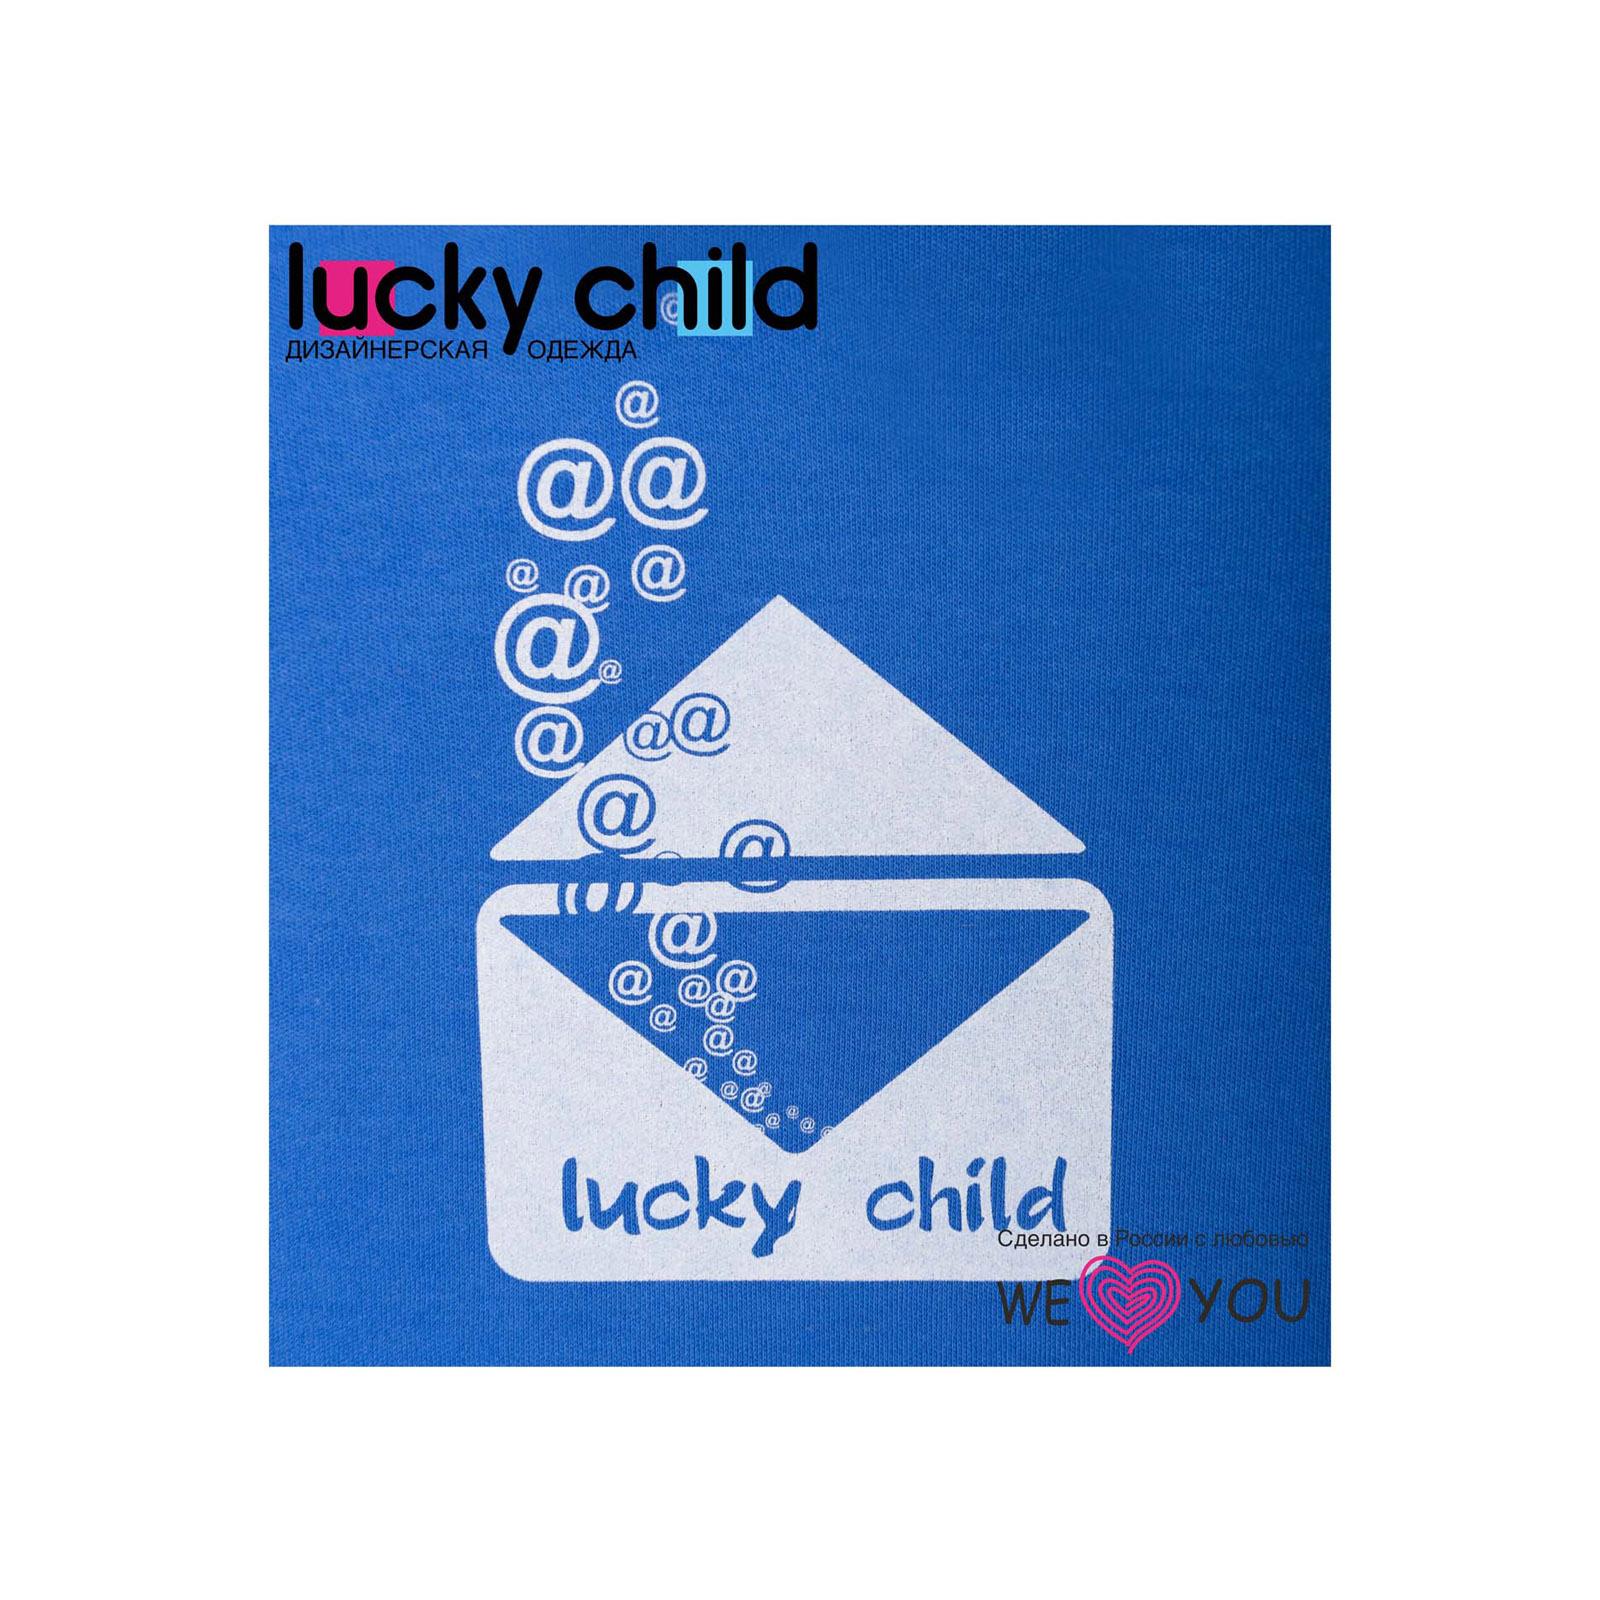 ��������� Lucky Child ��������� ���� ����� � ����� ������ 74